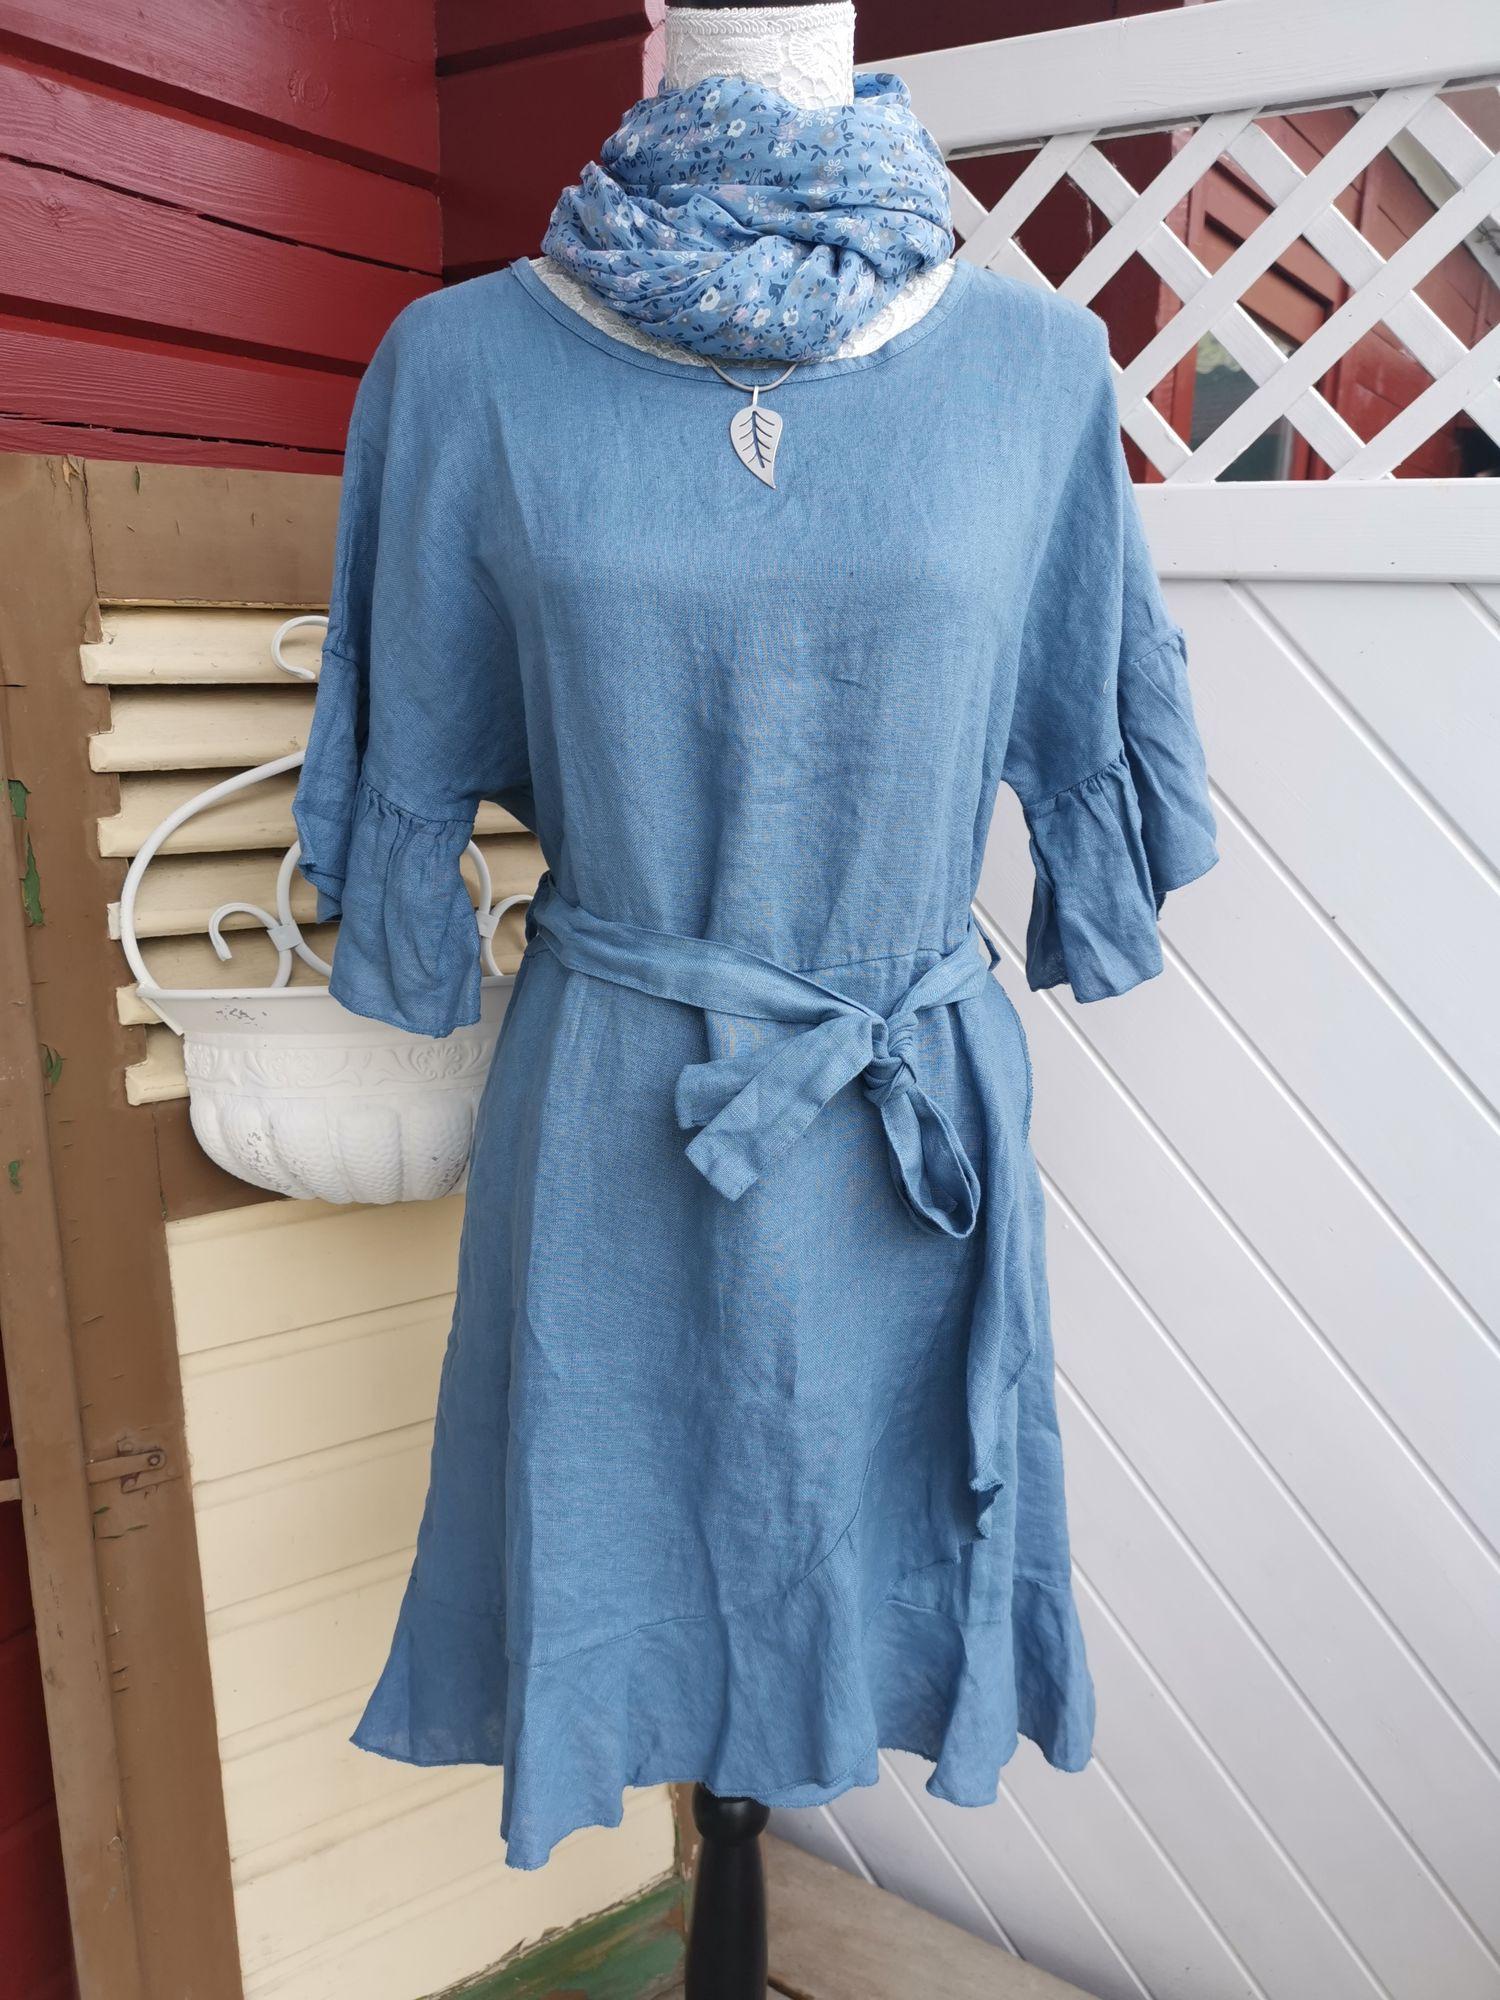 Kleid Leinen Sommerkleid In Beere Hellblau Weiß One Size